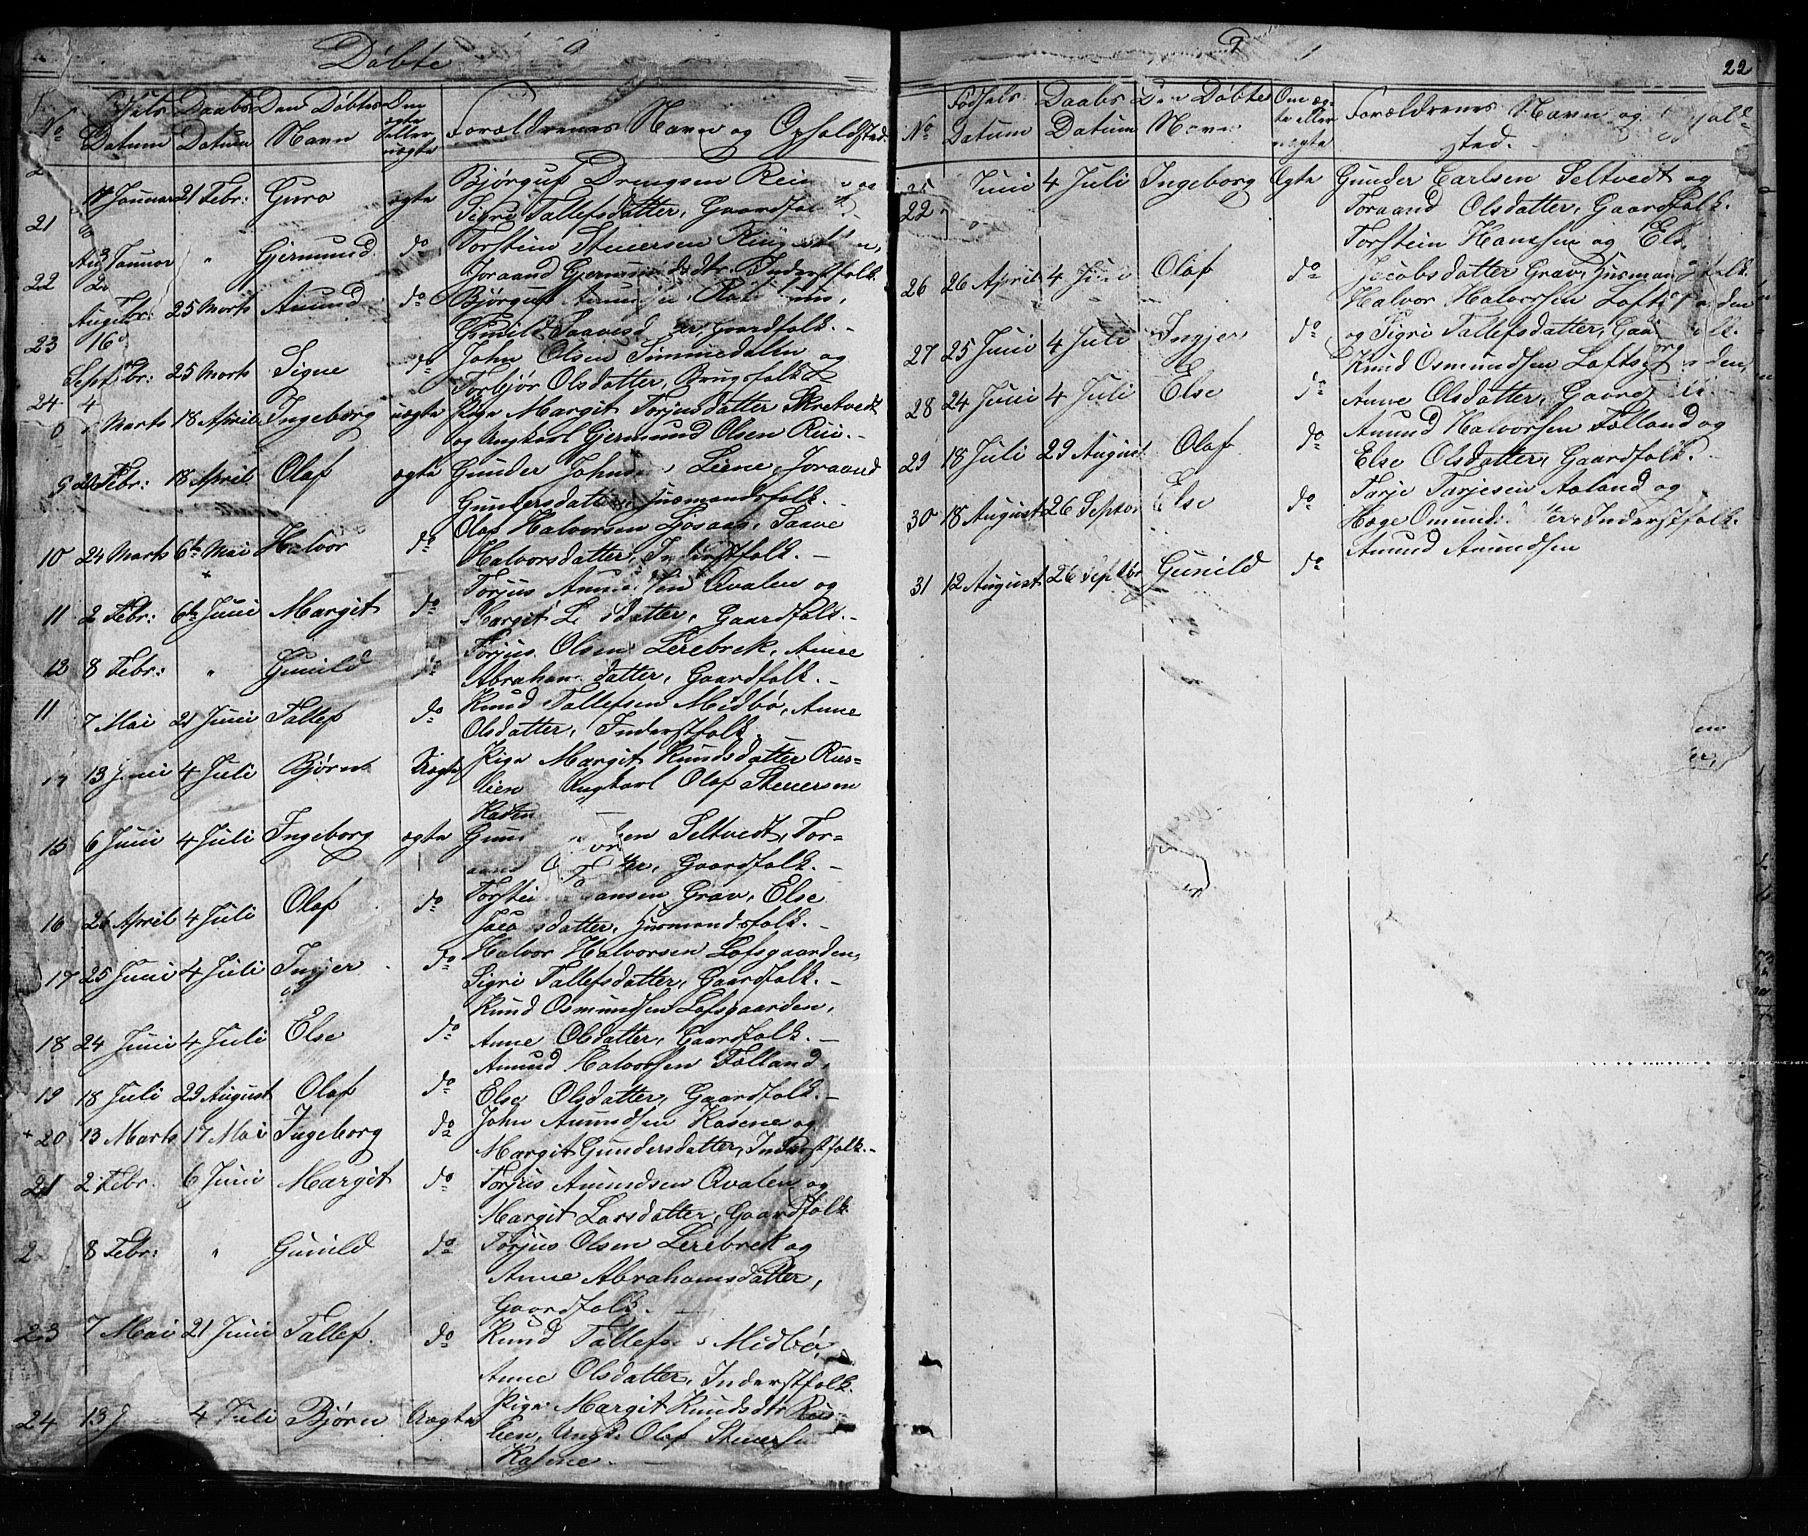 SAKO, Mo kirkebøker, G/Ga/L0001: Klokkerbok nr. I 1, 1851-1891, s. 21